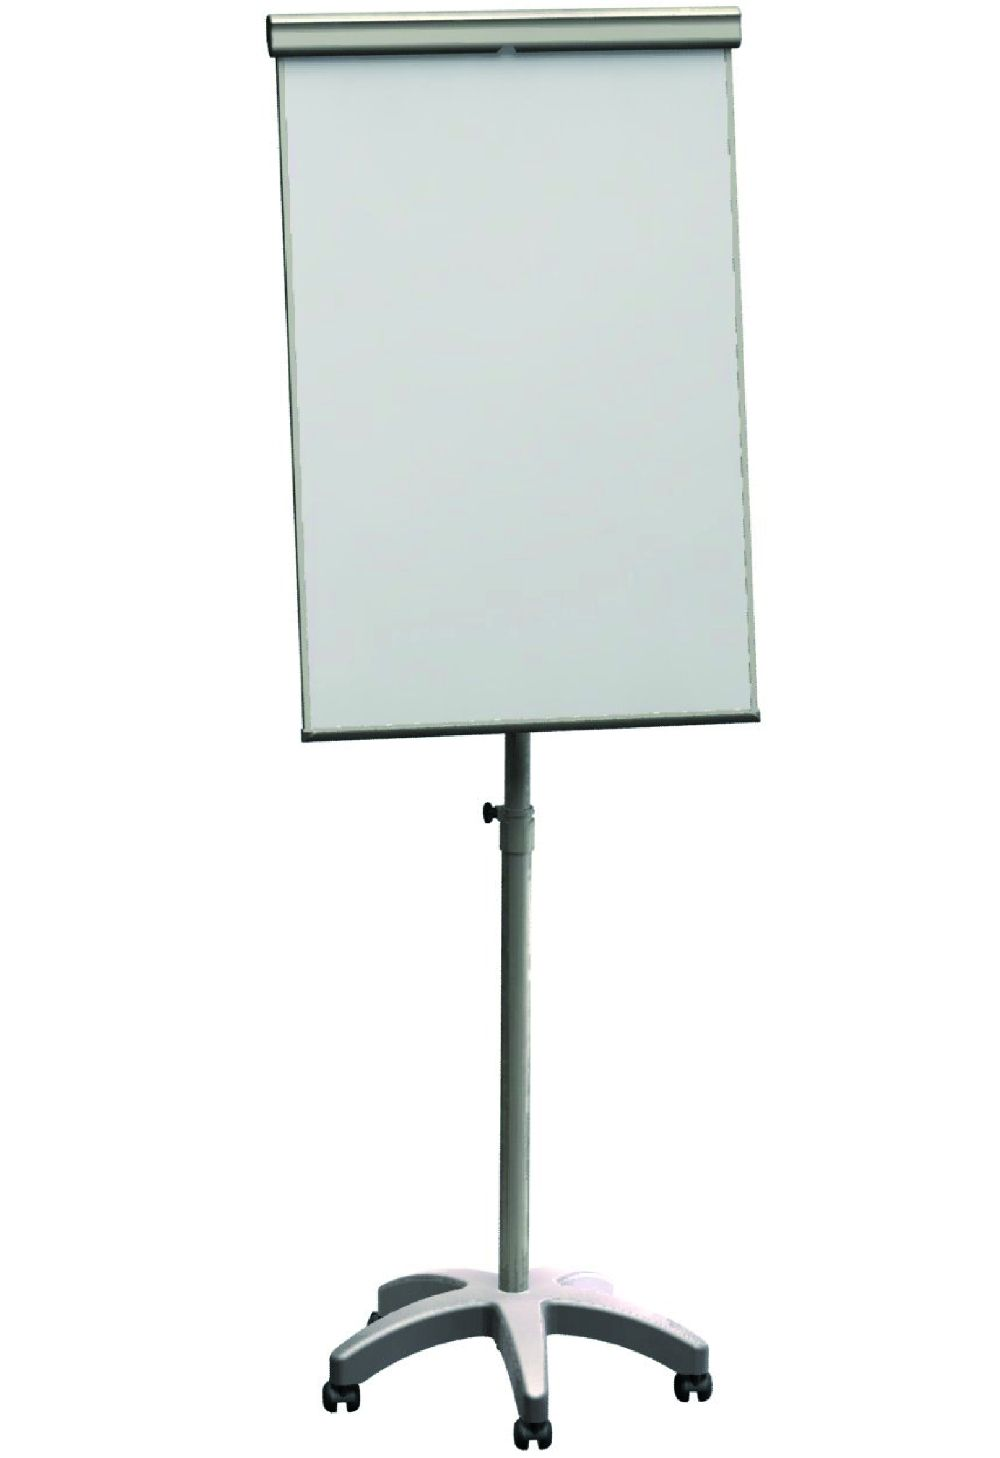 Flipchart s rameny, 105x68 cm, výška až 220 cm